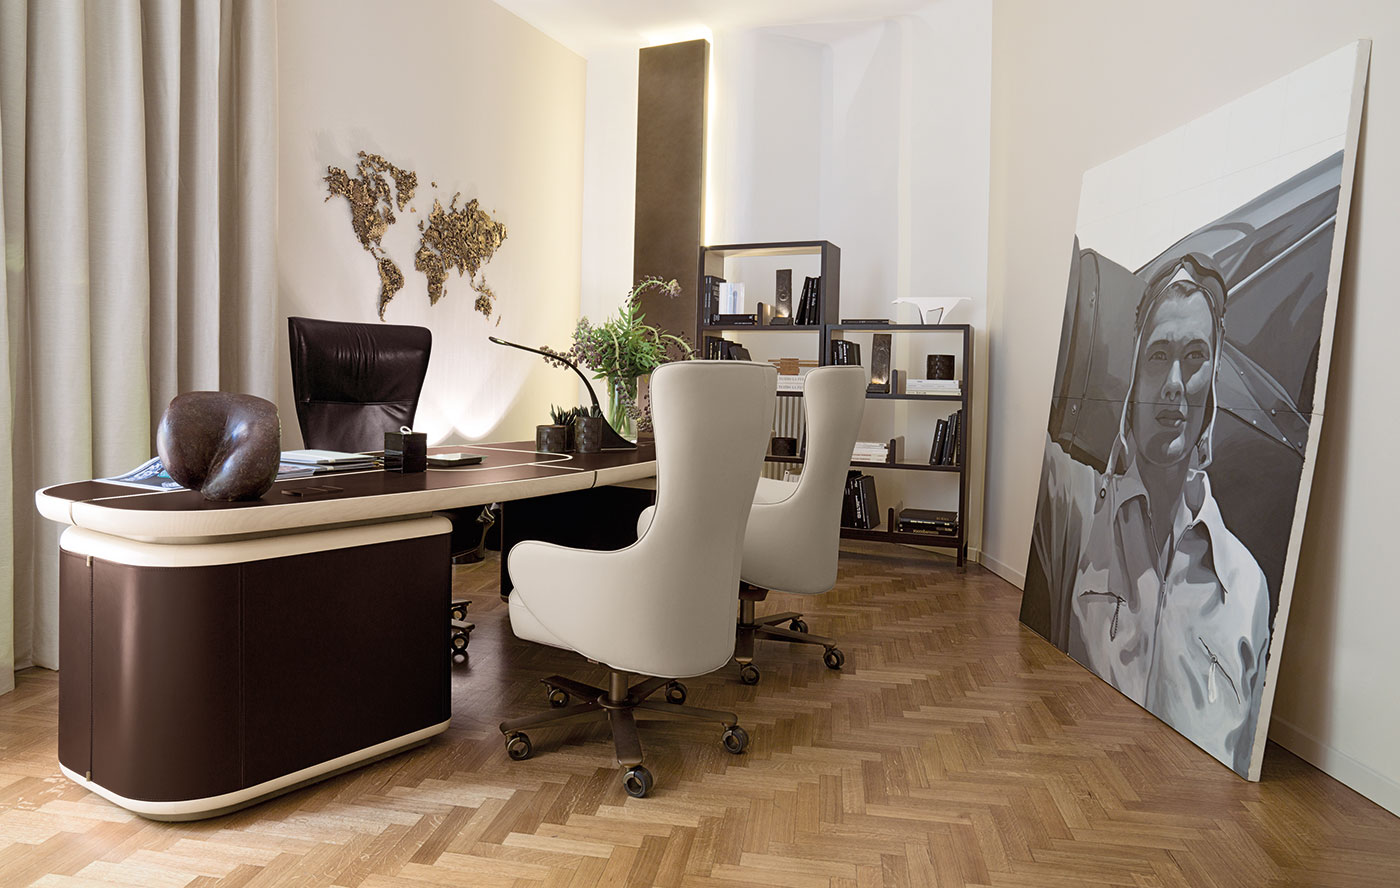 Obegi Home Working Space Giorgetti 5